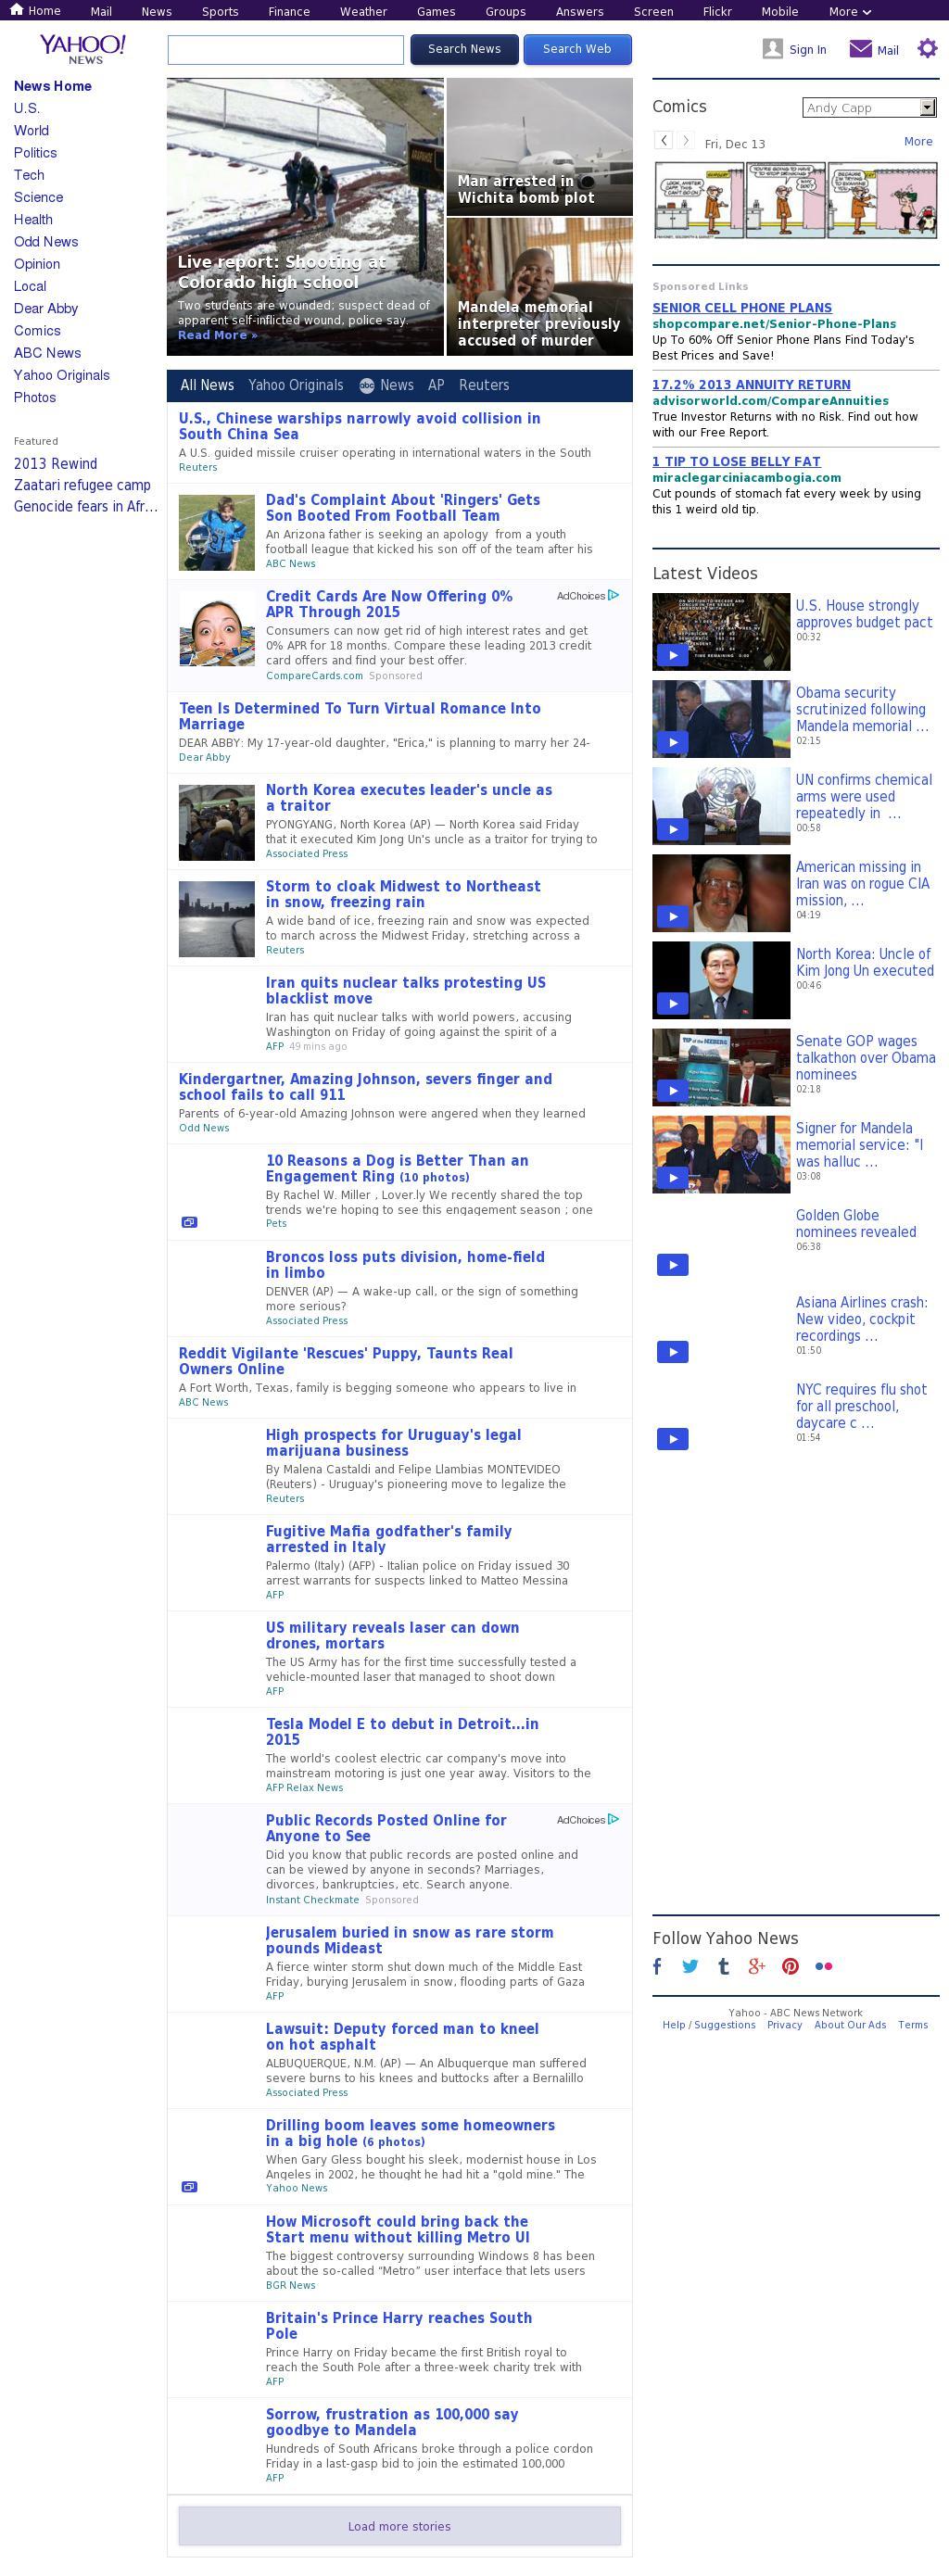 Yahoo! News at Friday Dec. 13, 2013, 9:18 p.m. UTC